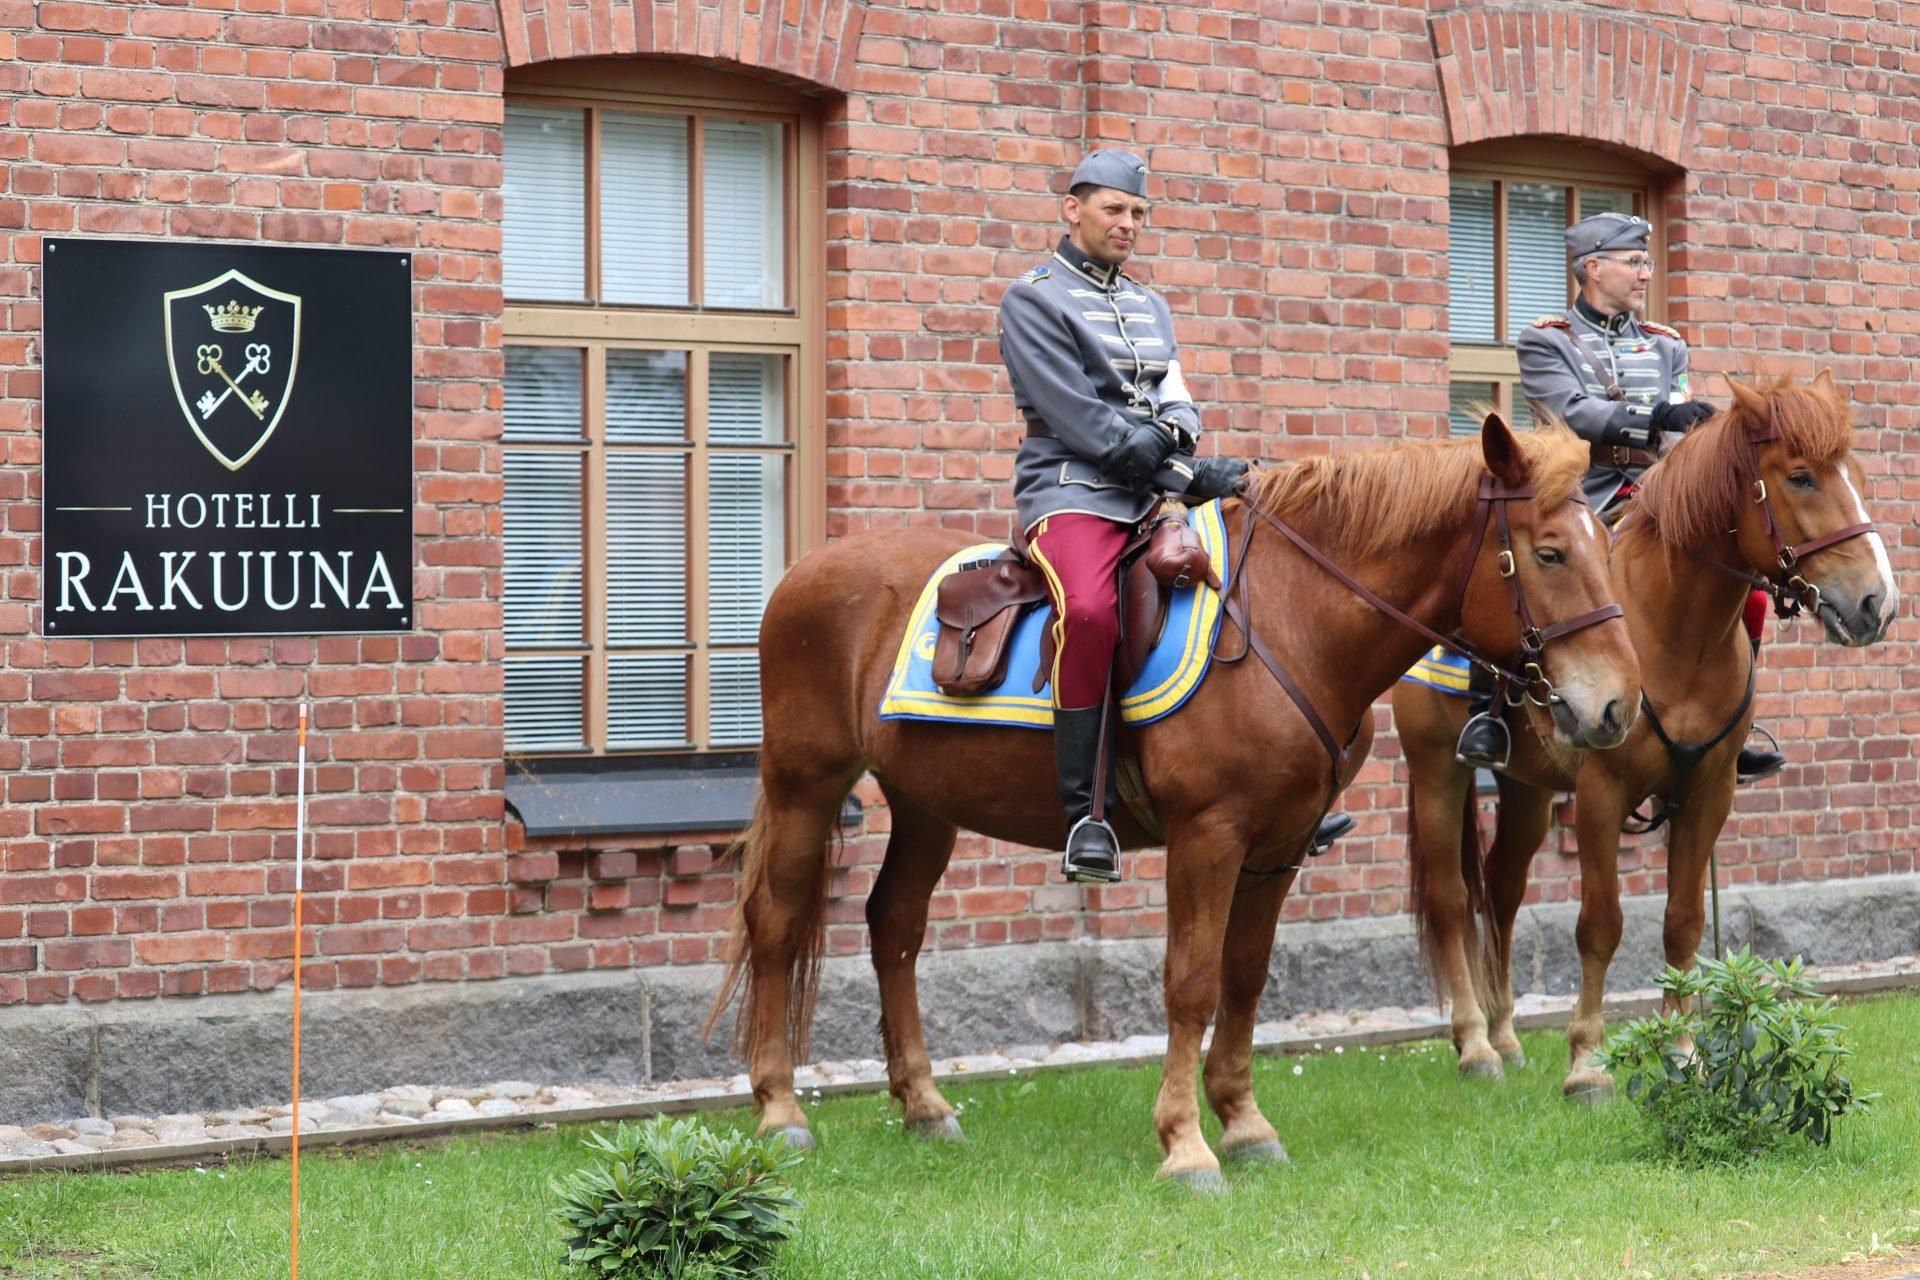 Lappeenranta hotelli rakuuna rakuunaratsukko hevonen tiilitalo